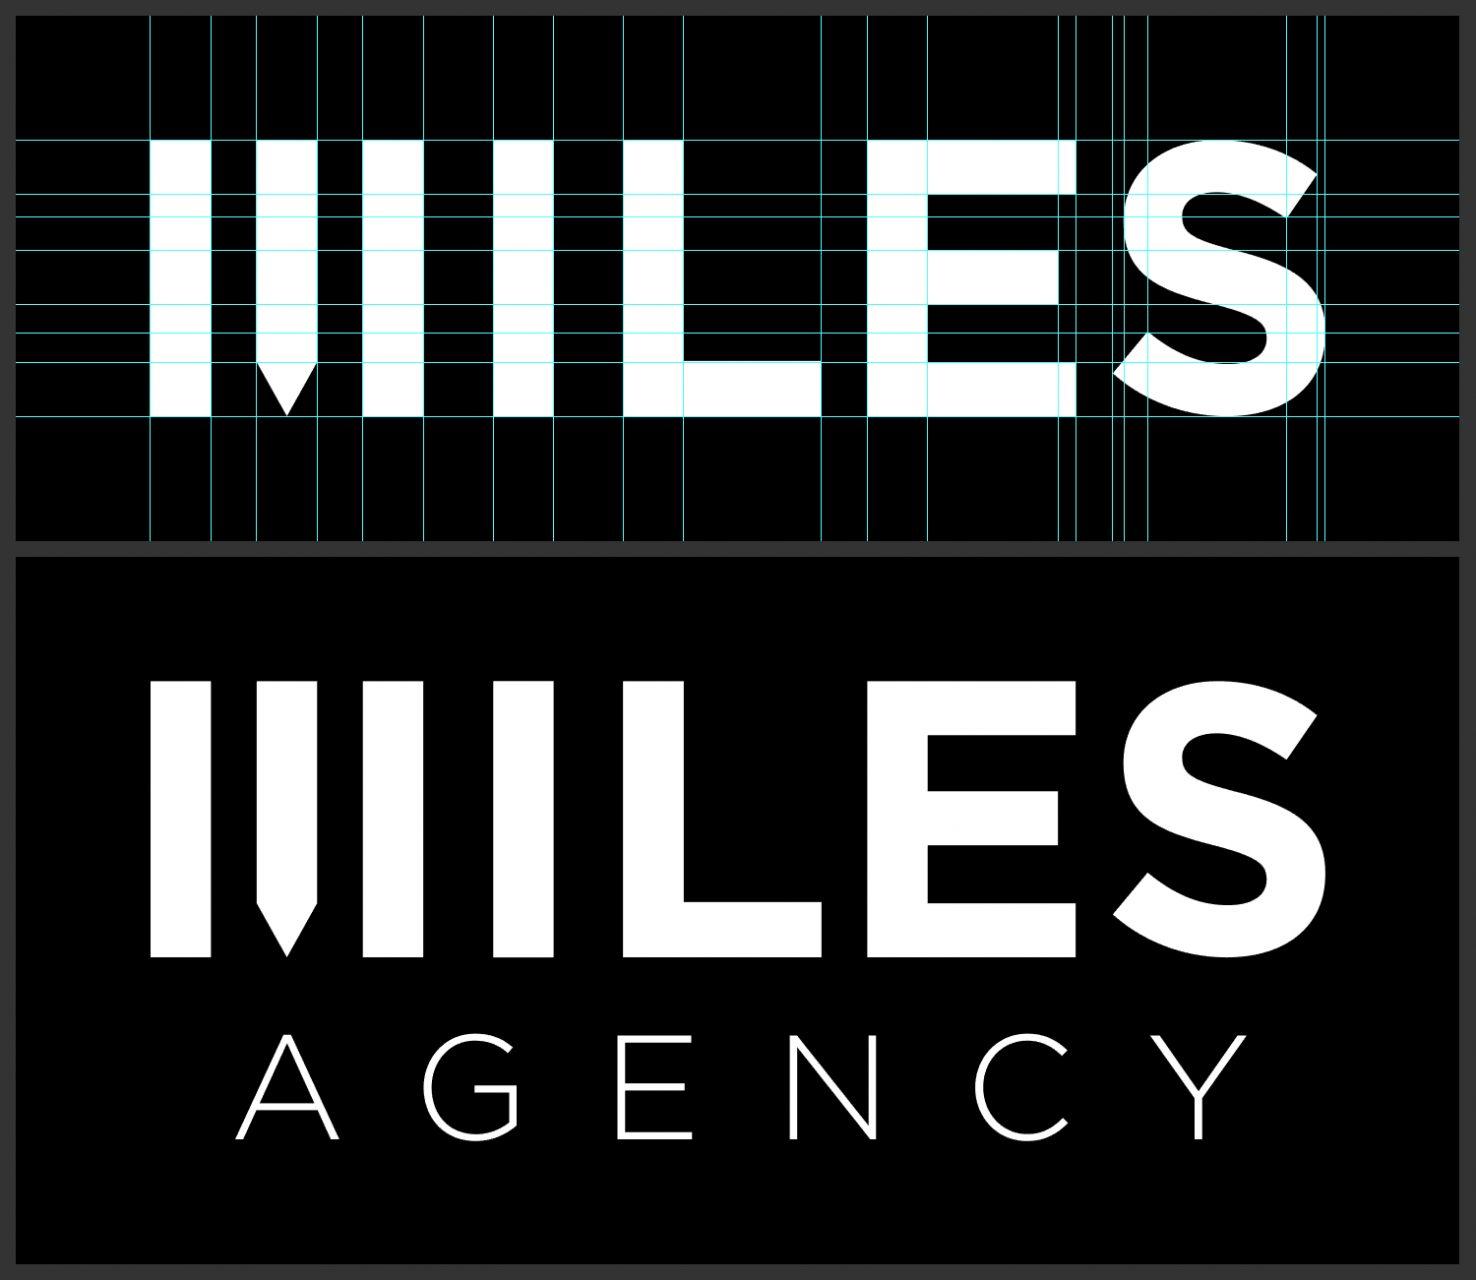 MILES Agency